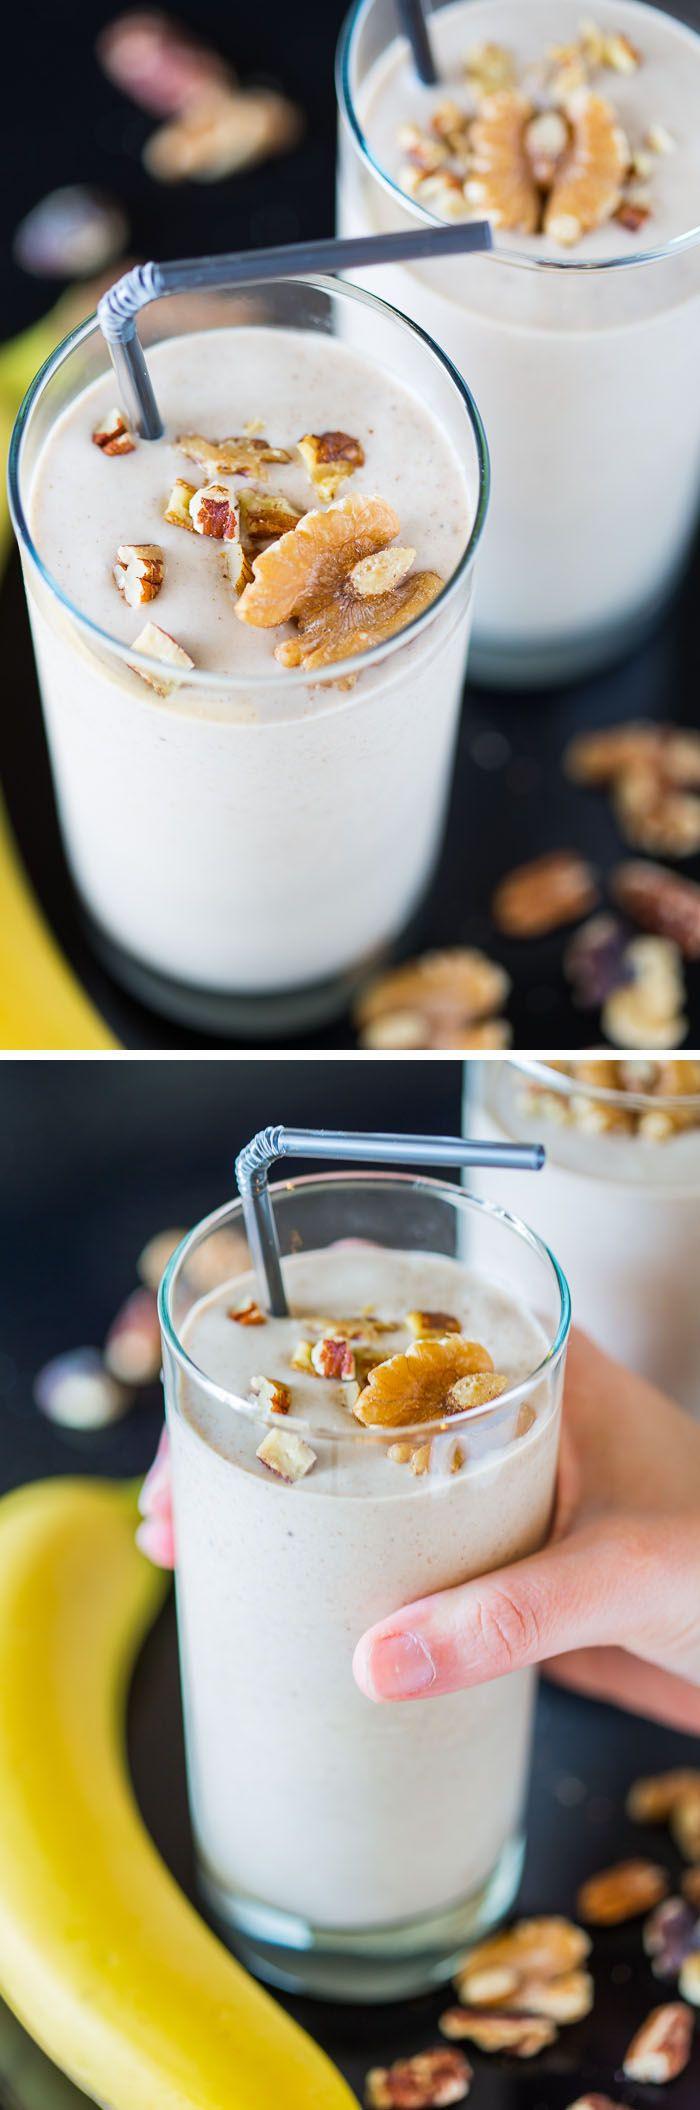 Vegan Protein Smoothie Recipes  Banana Nut Crunch Smoothie vegan refined sugar free